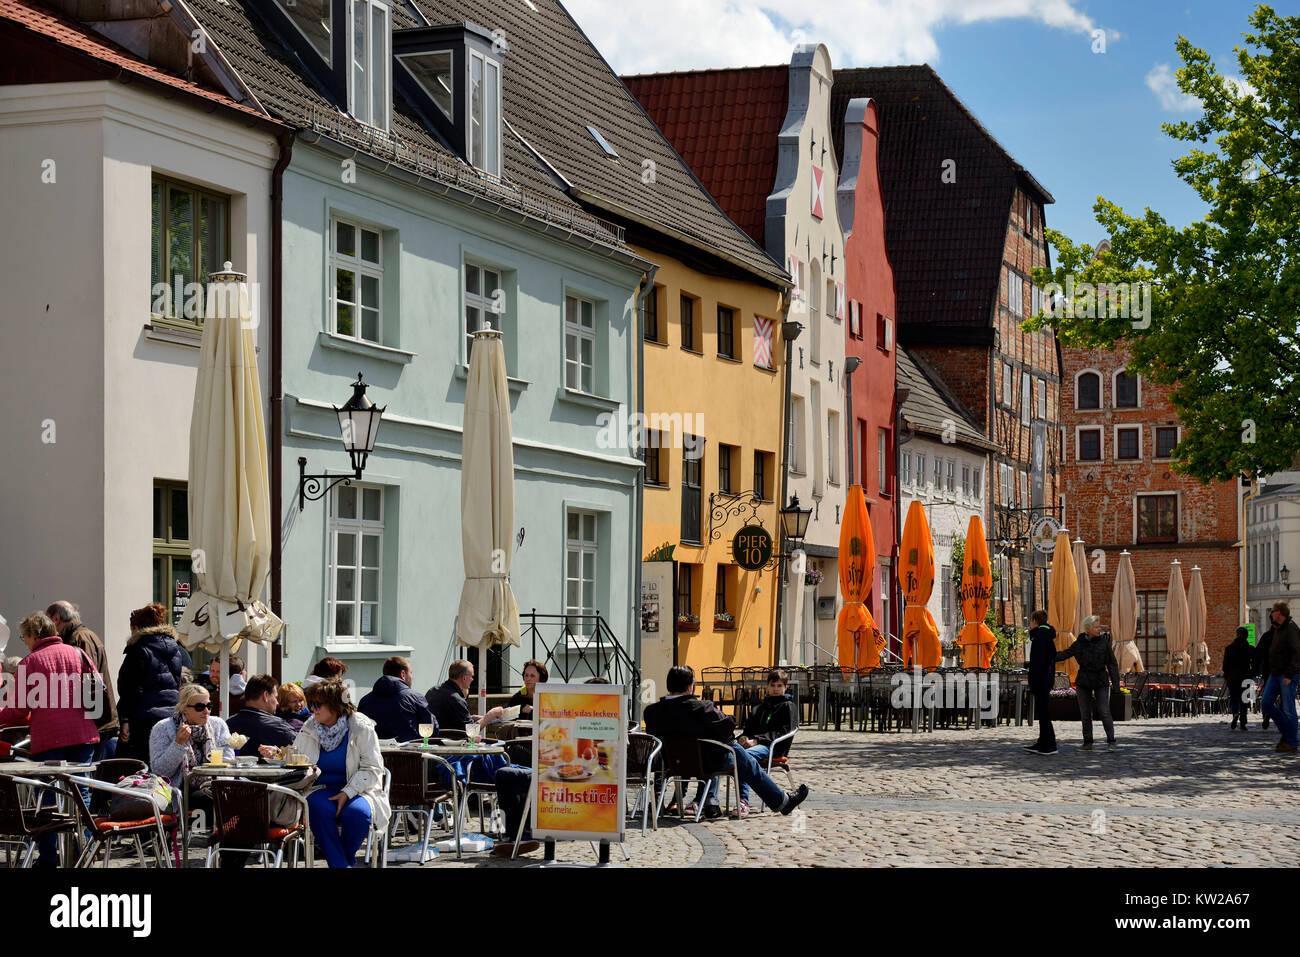 Wismar, historical street of houses mountain Loh, Historischer Strassenzug Lohberg - Stock Image